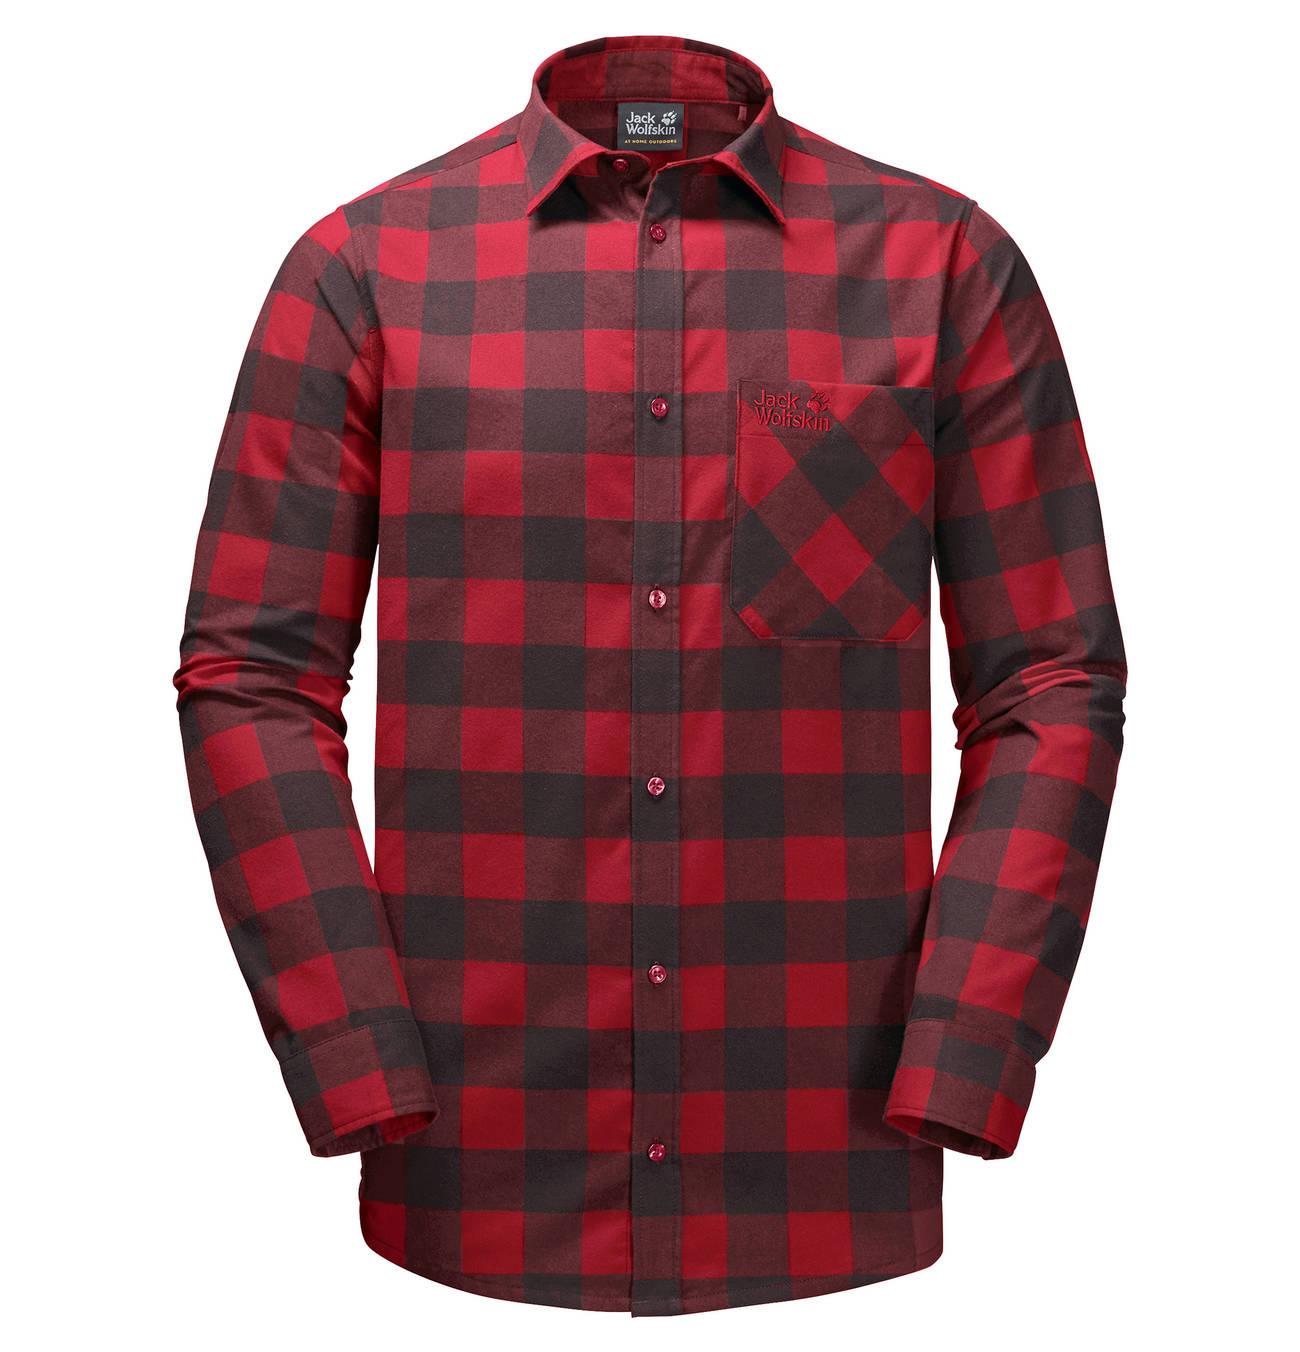 Camping & Hiking Jack Wolfskin Mens Red River Shirt Hemd Für